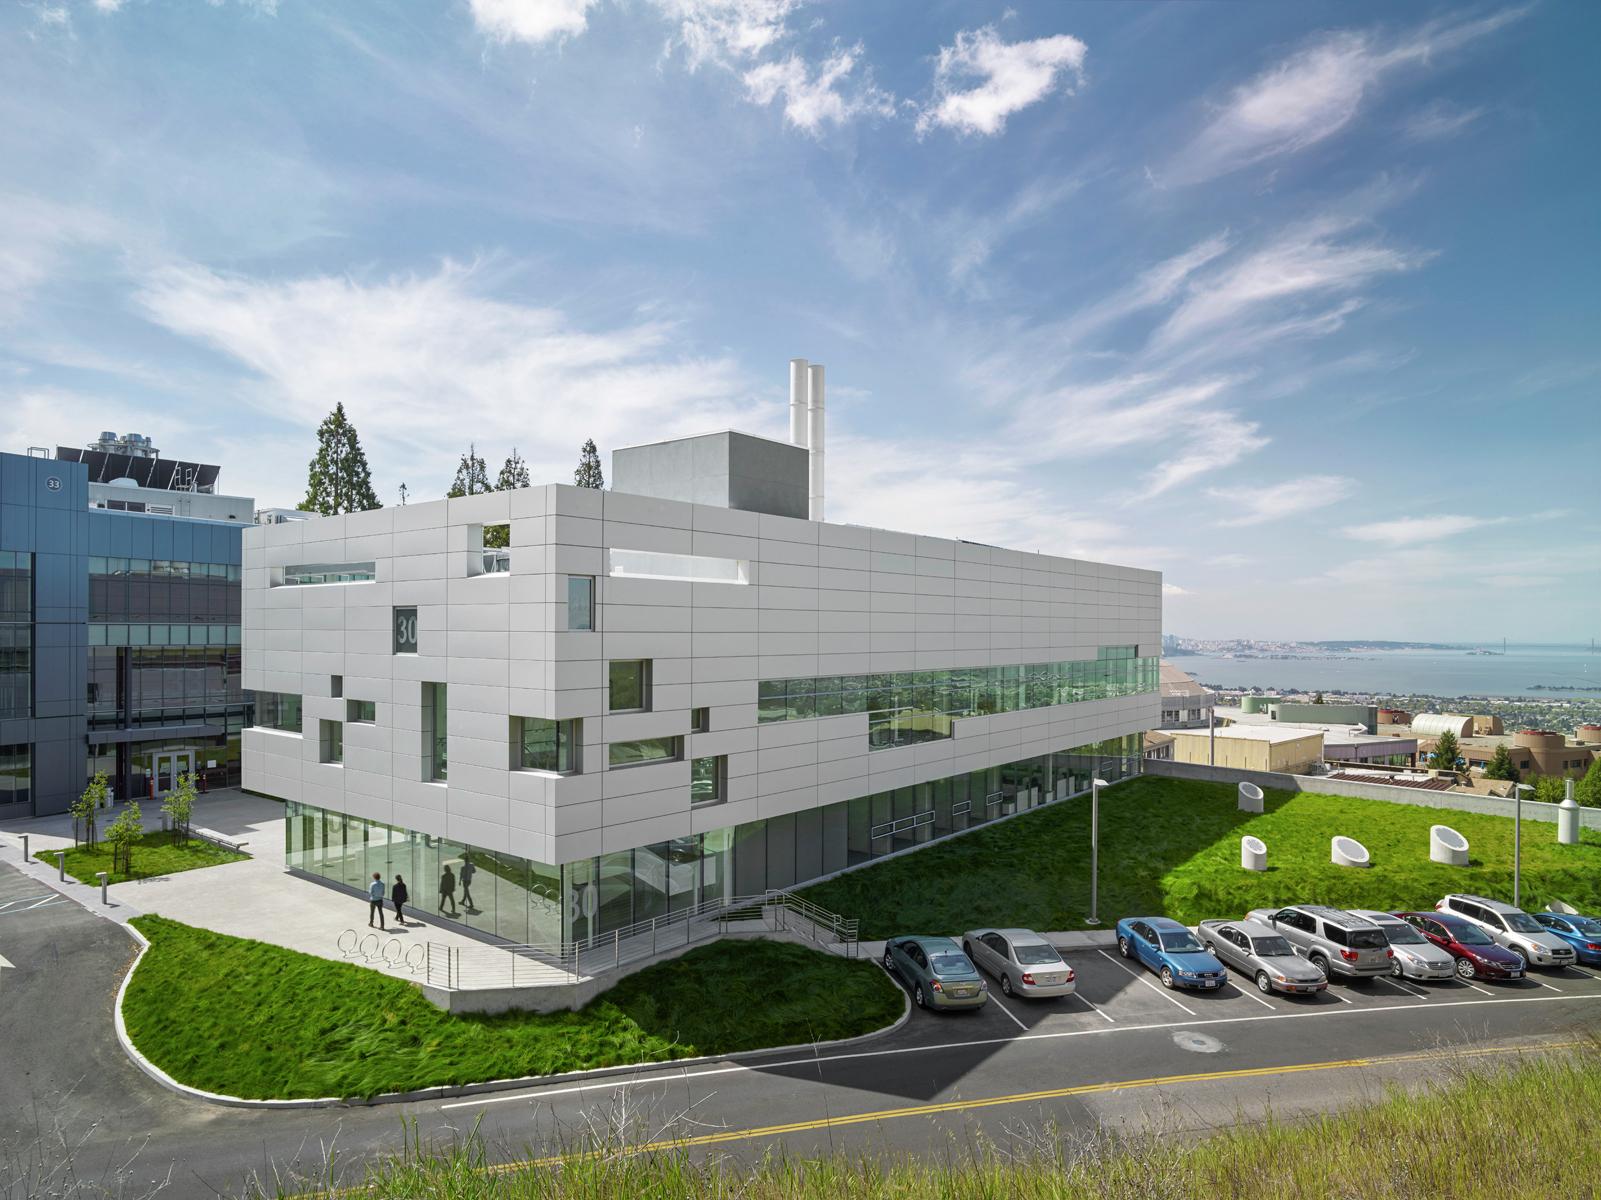 Gallery of Chu Hall - Solar Energy Research Center / SmithGroupJJR - 6